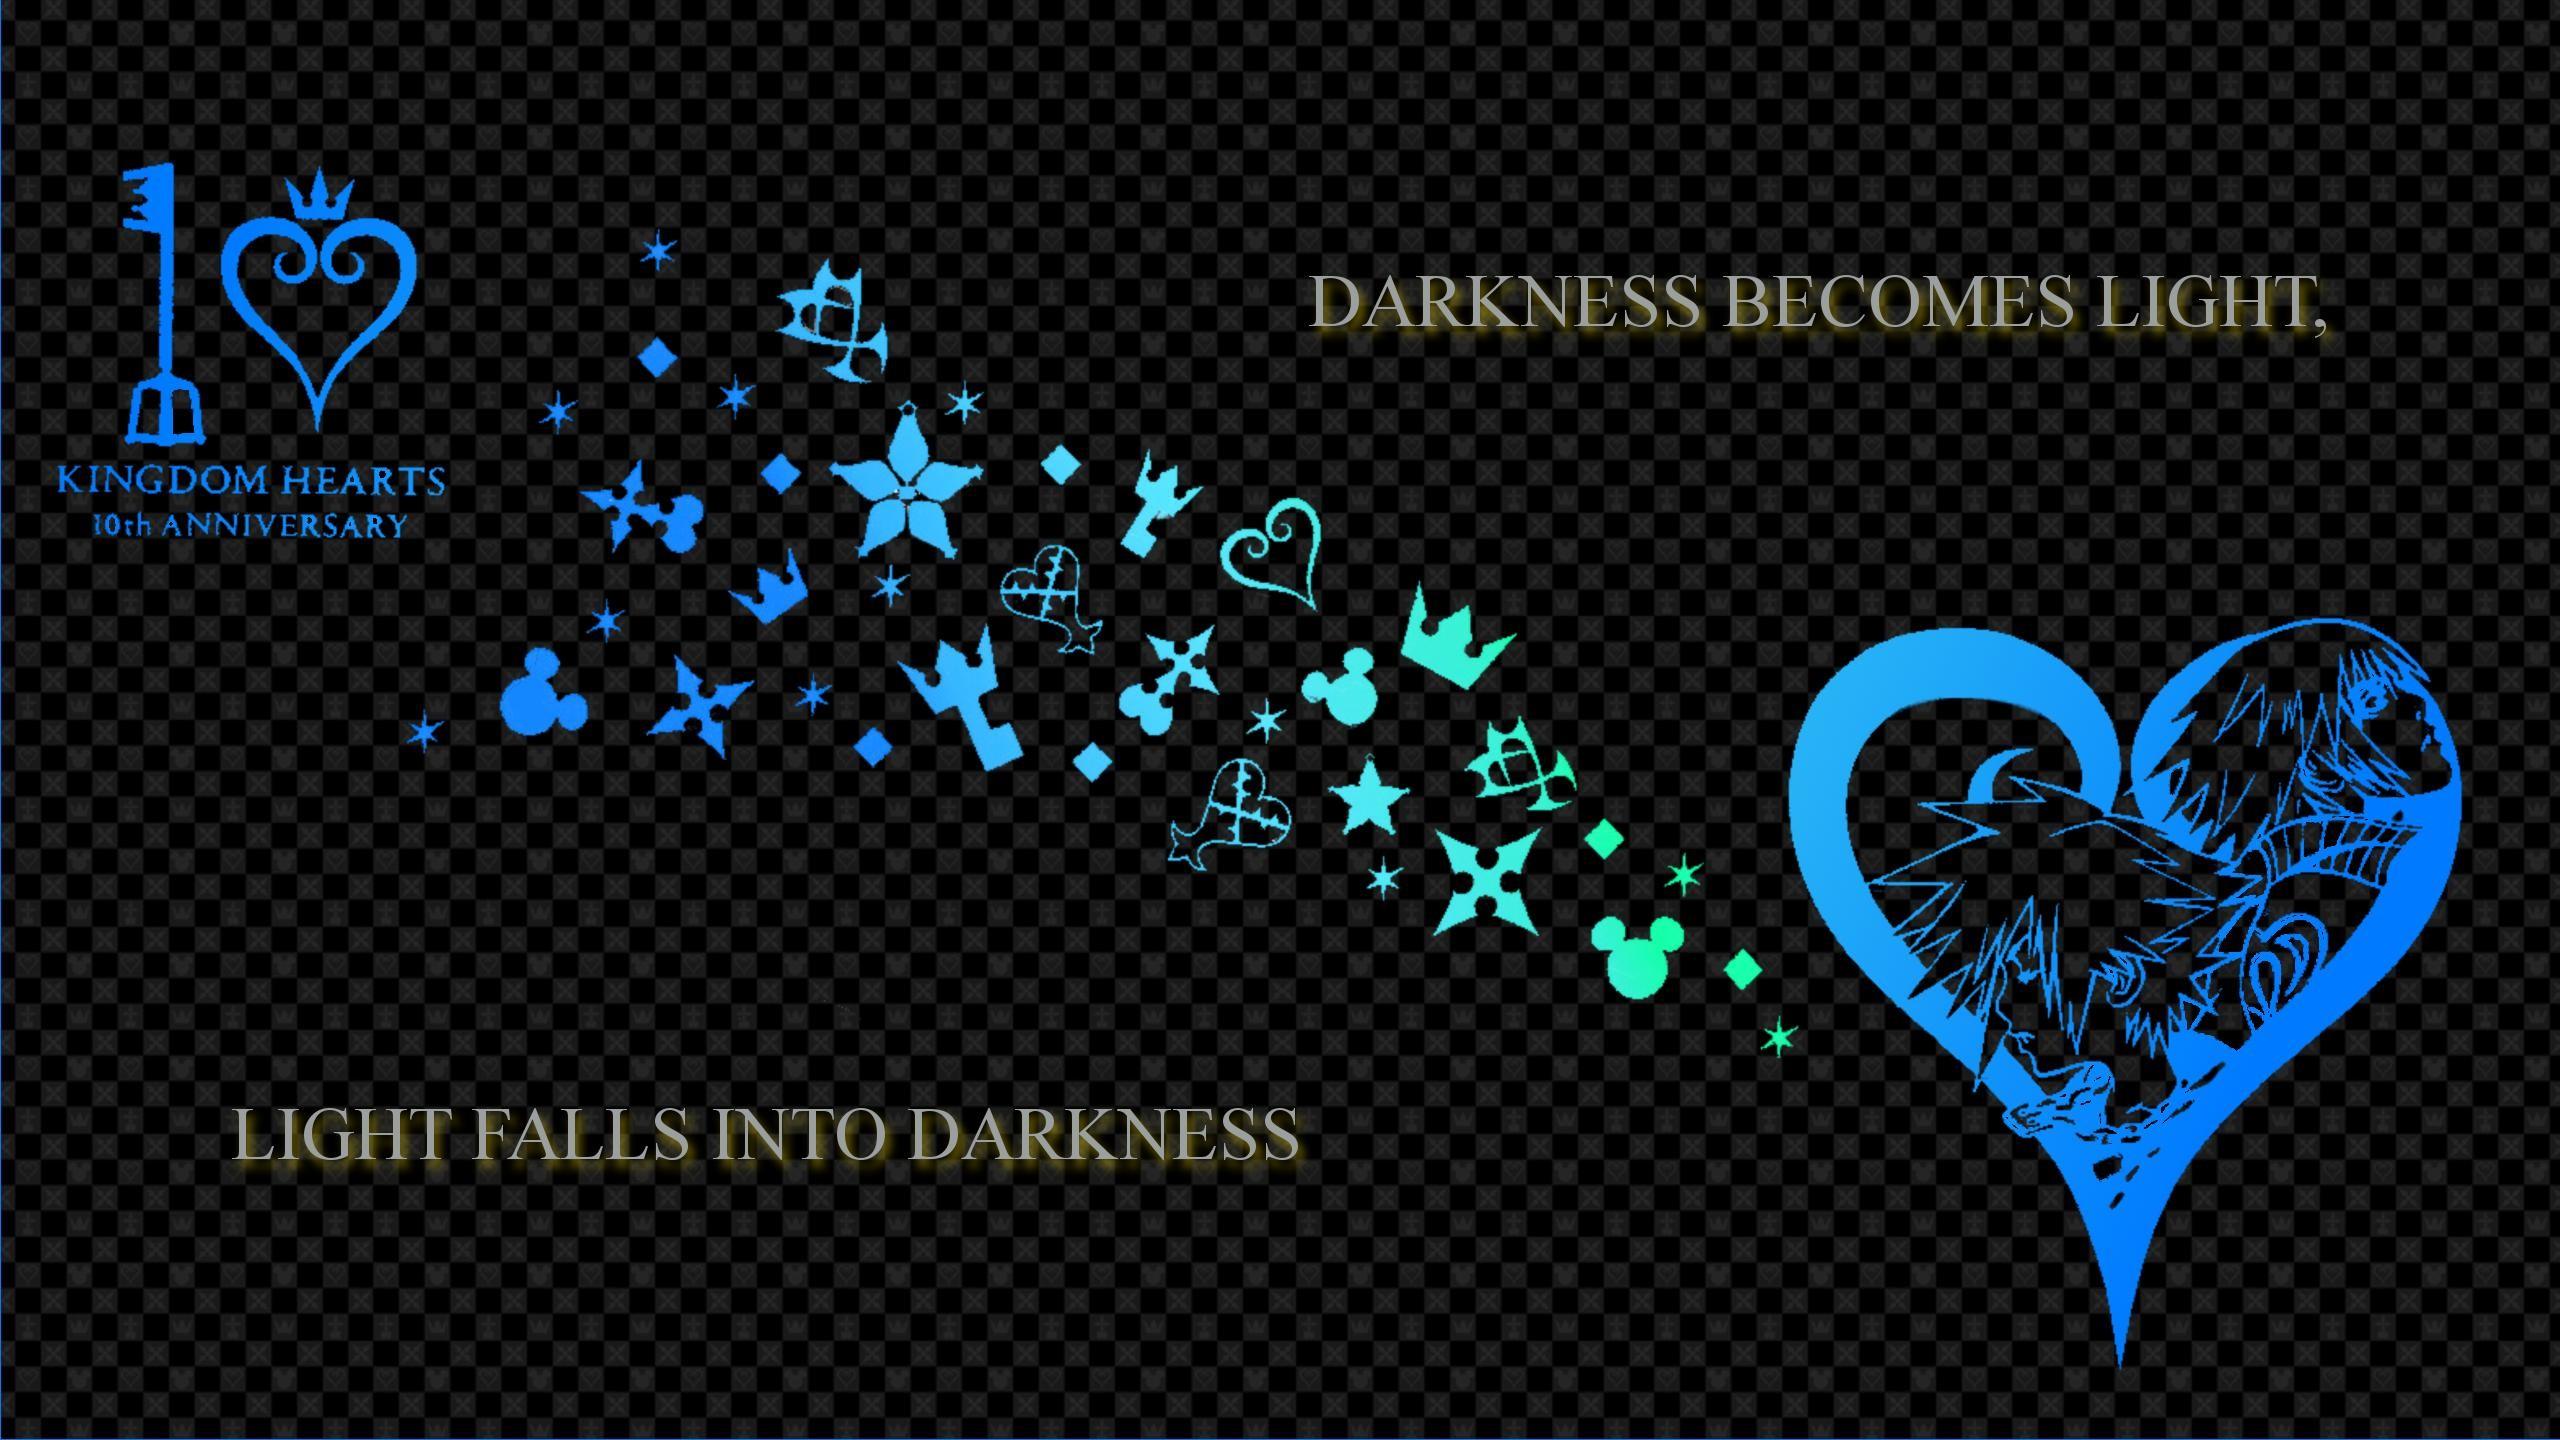 Kingdom Hearts Wallpapers 1080p For Desktop Wallpaper 2560 x 1440 px 1.08  MB 1920×1080 heartless sora